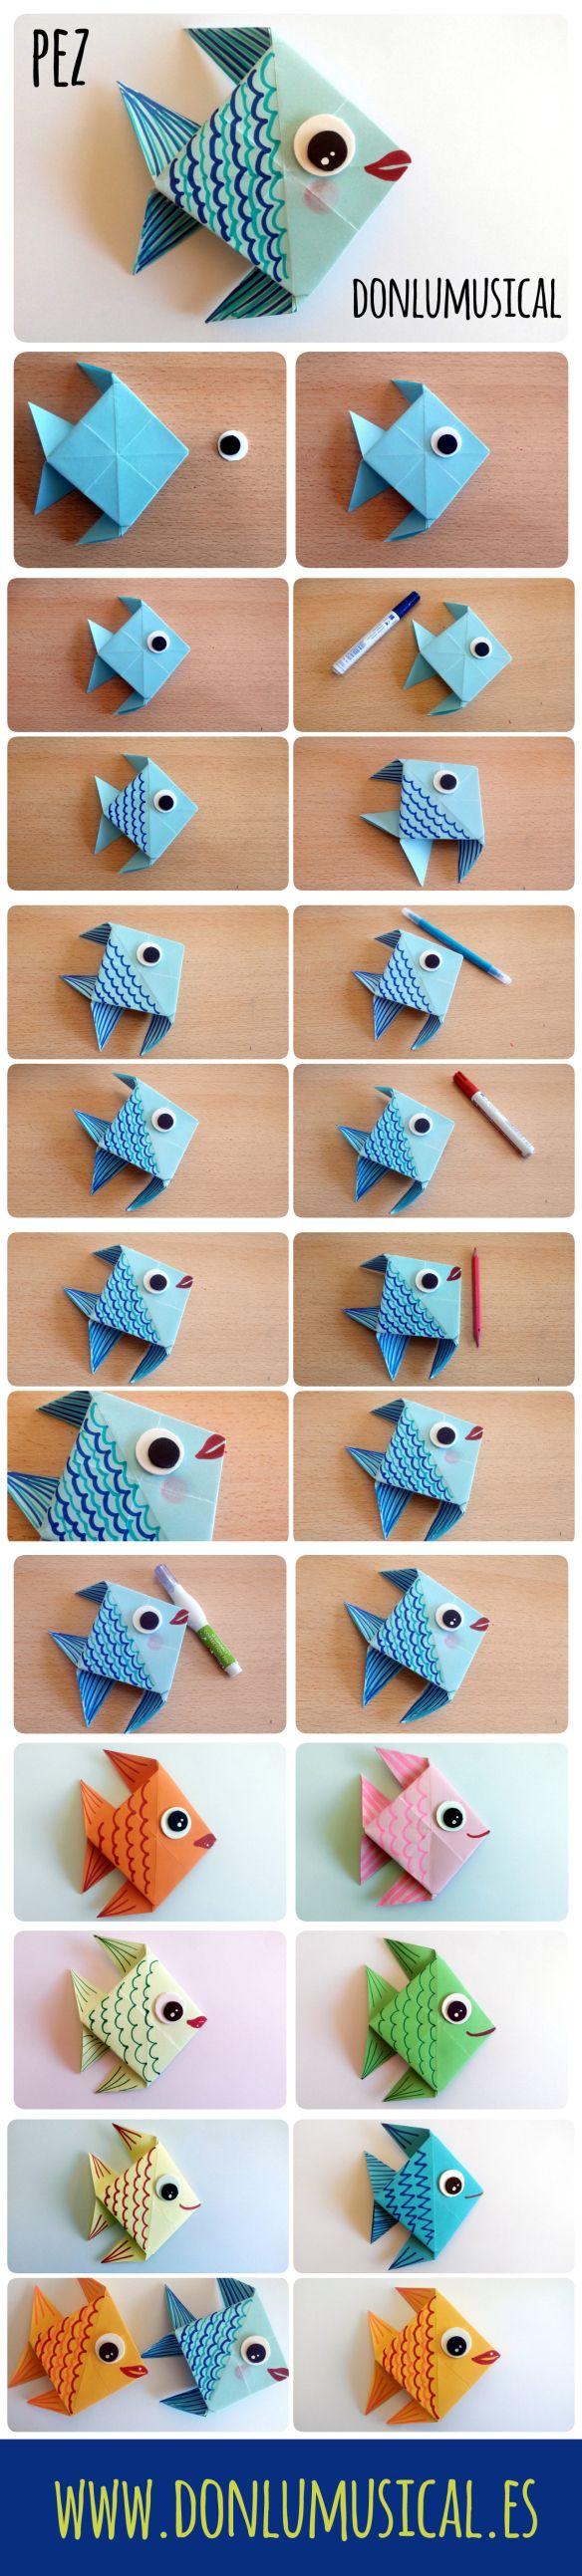 Fantasas De Papel Origami Fish Diy Ratrat Origamiorigami Rat Diagram Guide Tutorial Papiroflexia Pez From Paper Fisch Gebastelt Gefaltet